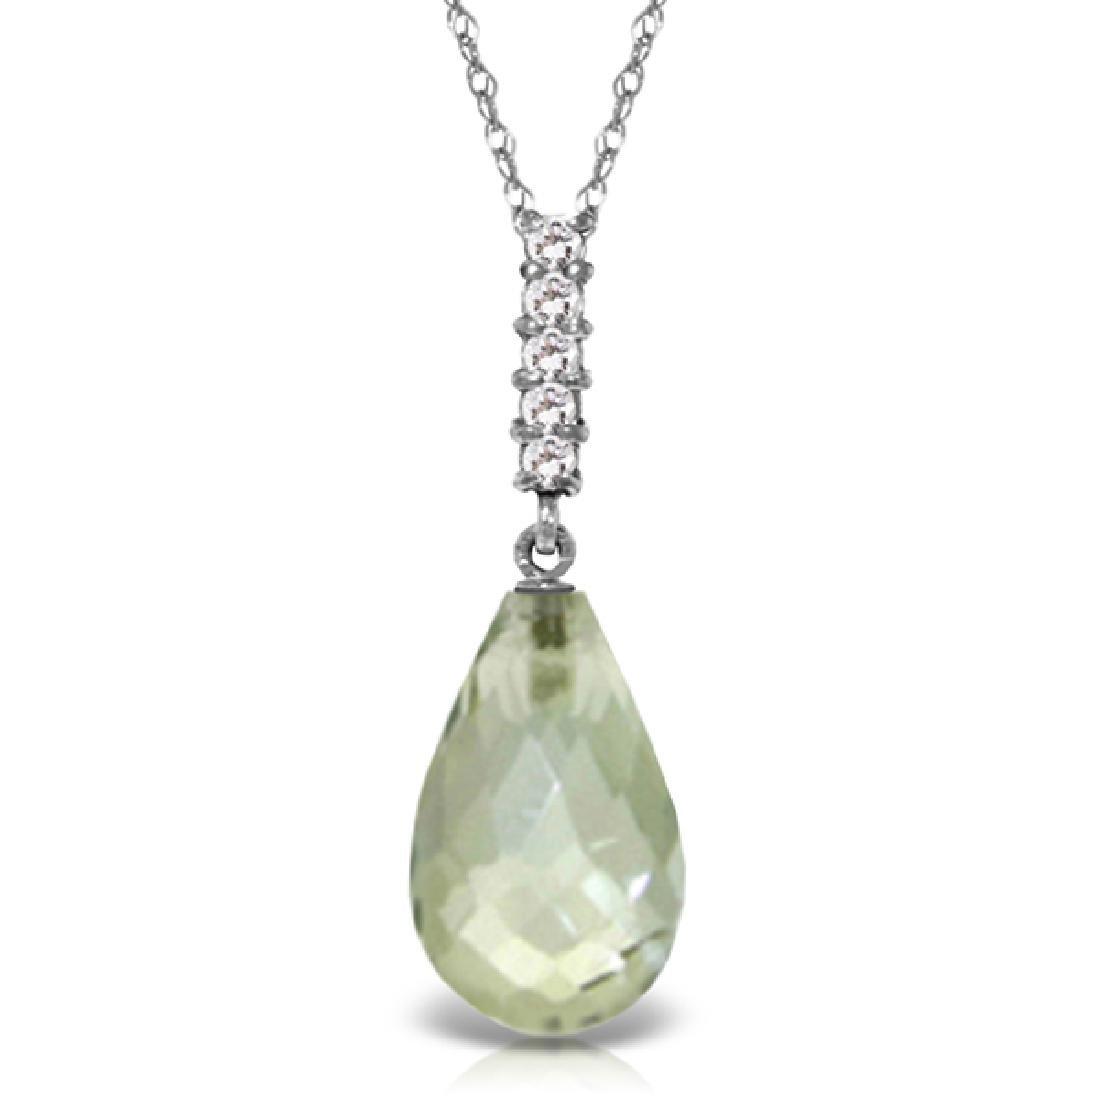 Genuine 5.38 ctw Amethyst & Diamond Necklace Jewelry